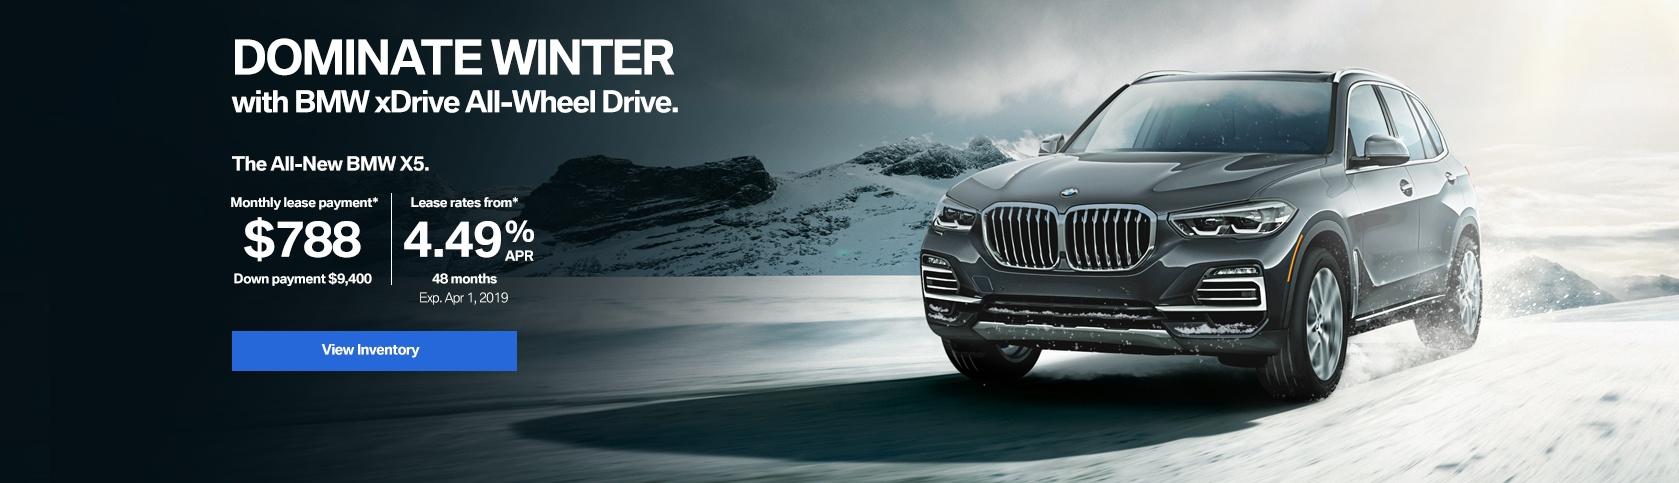 Endras BMW X5